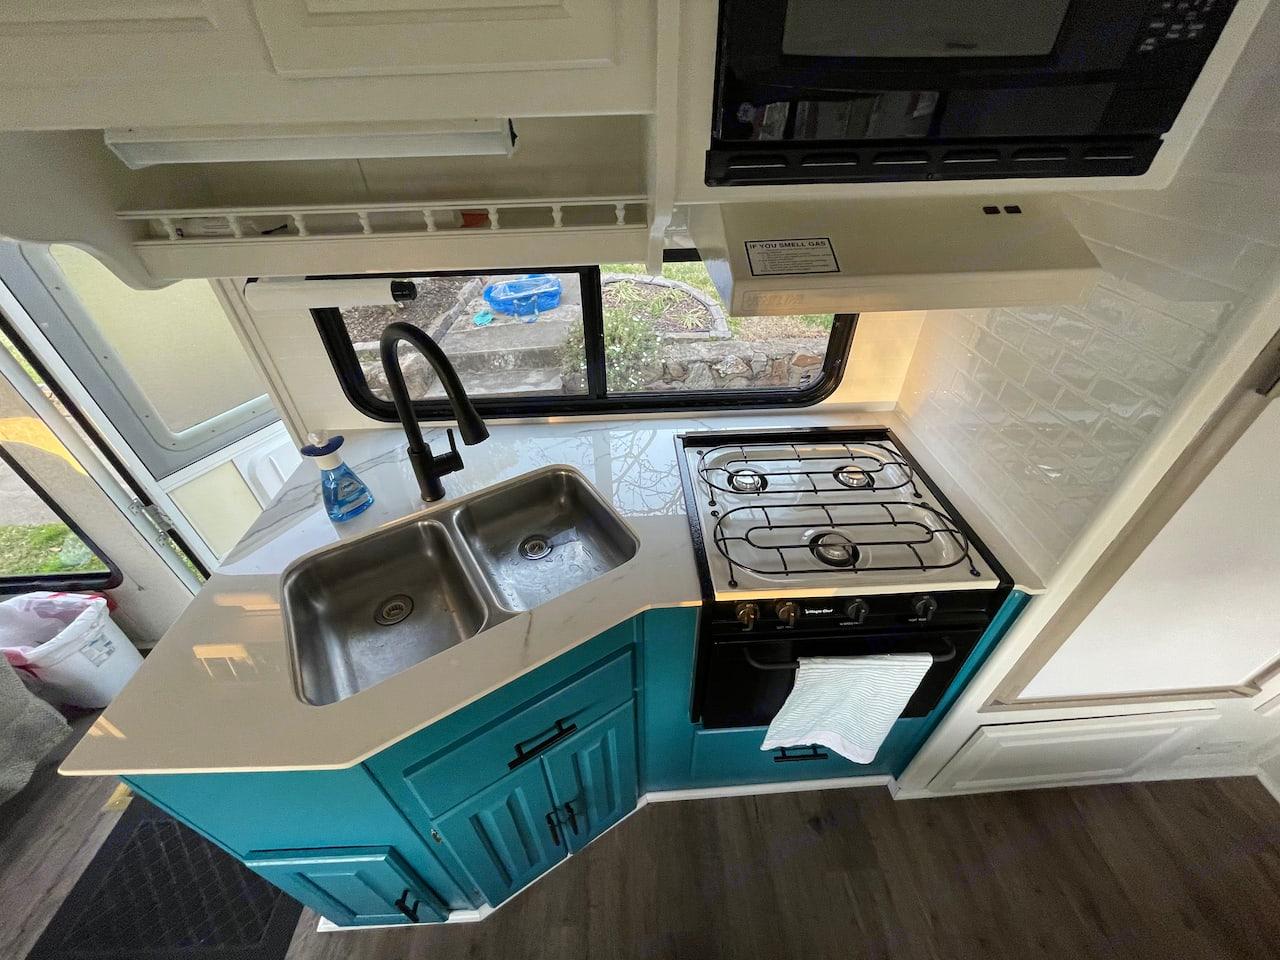 Ceramic countertop with new faucet, kitchen hardware, and paint. . Coachmen Santara 2001